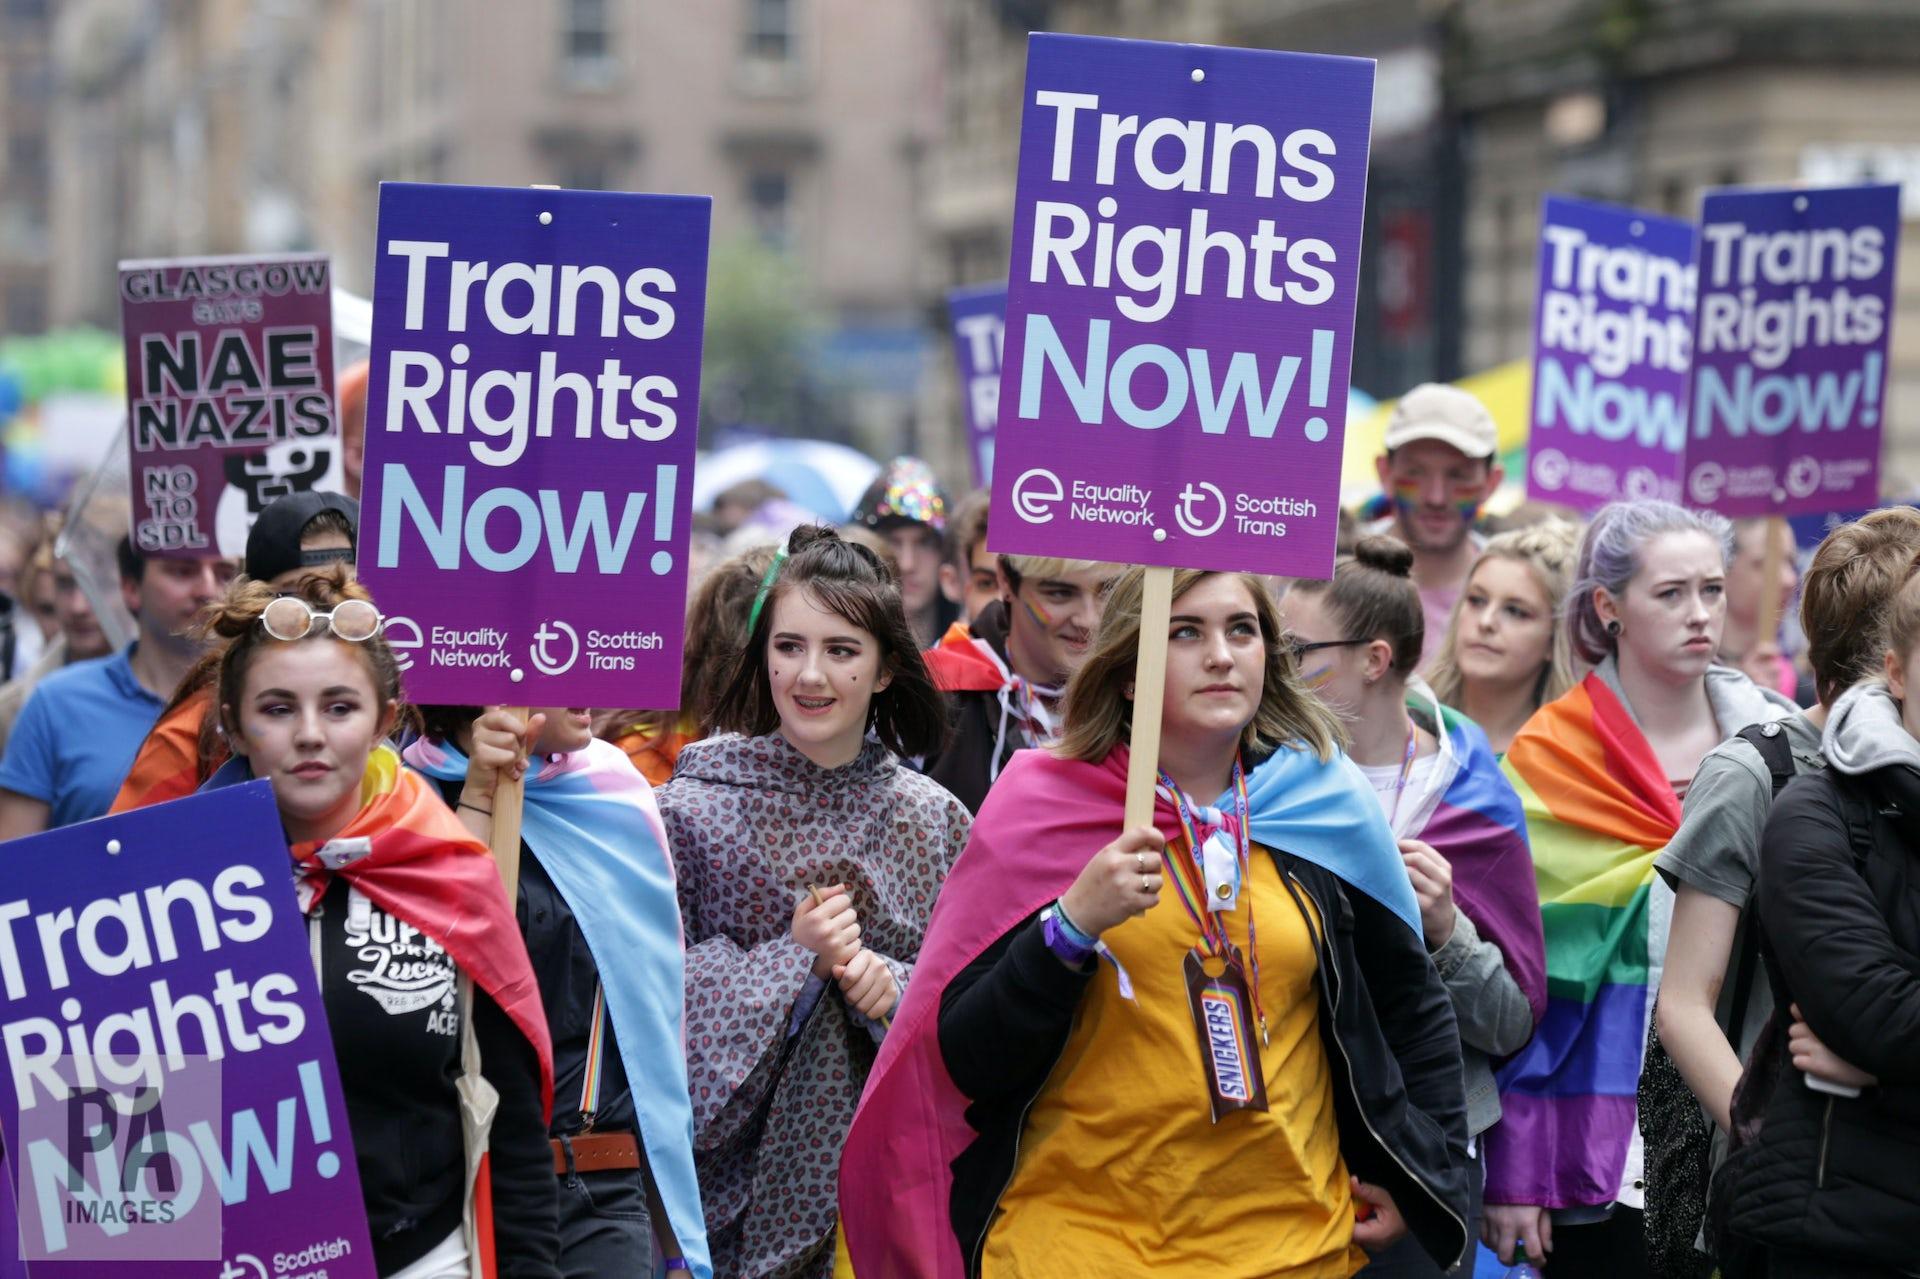 Transsexuals should cut it out original article